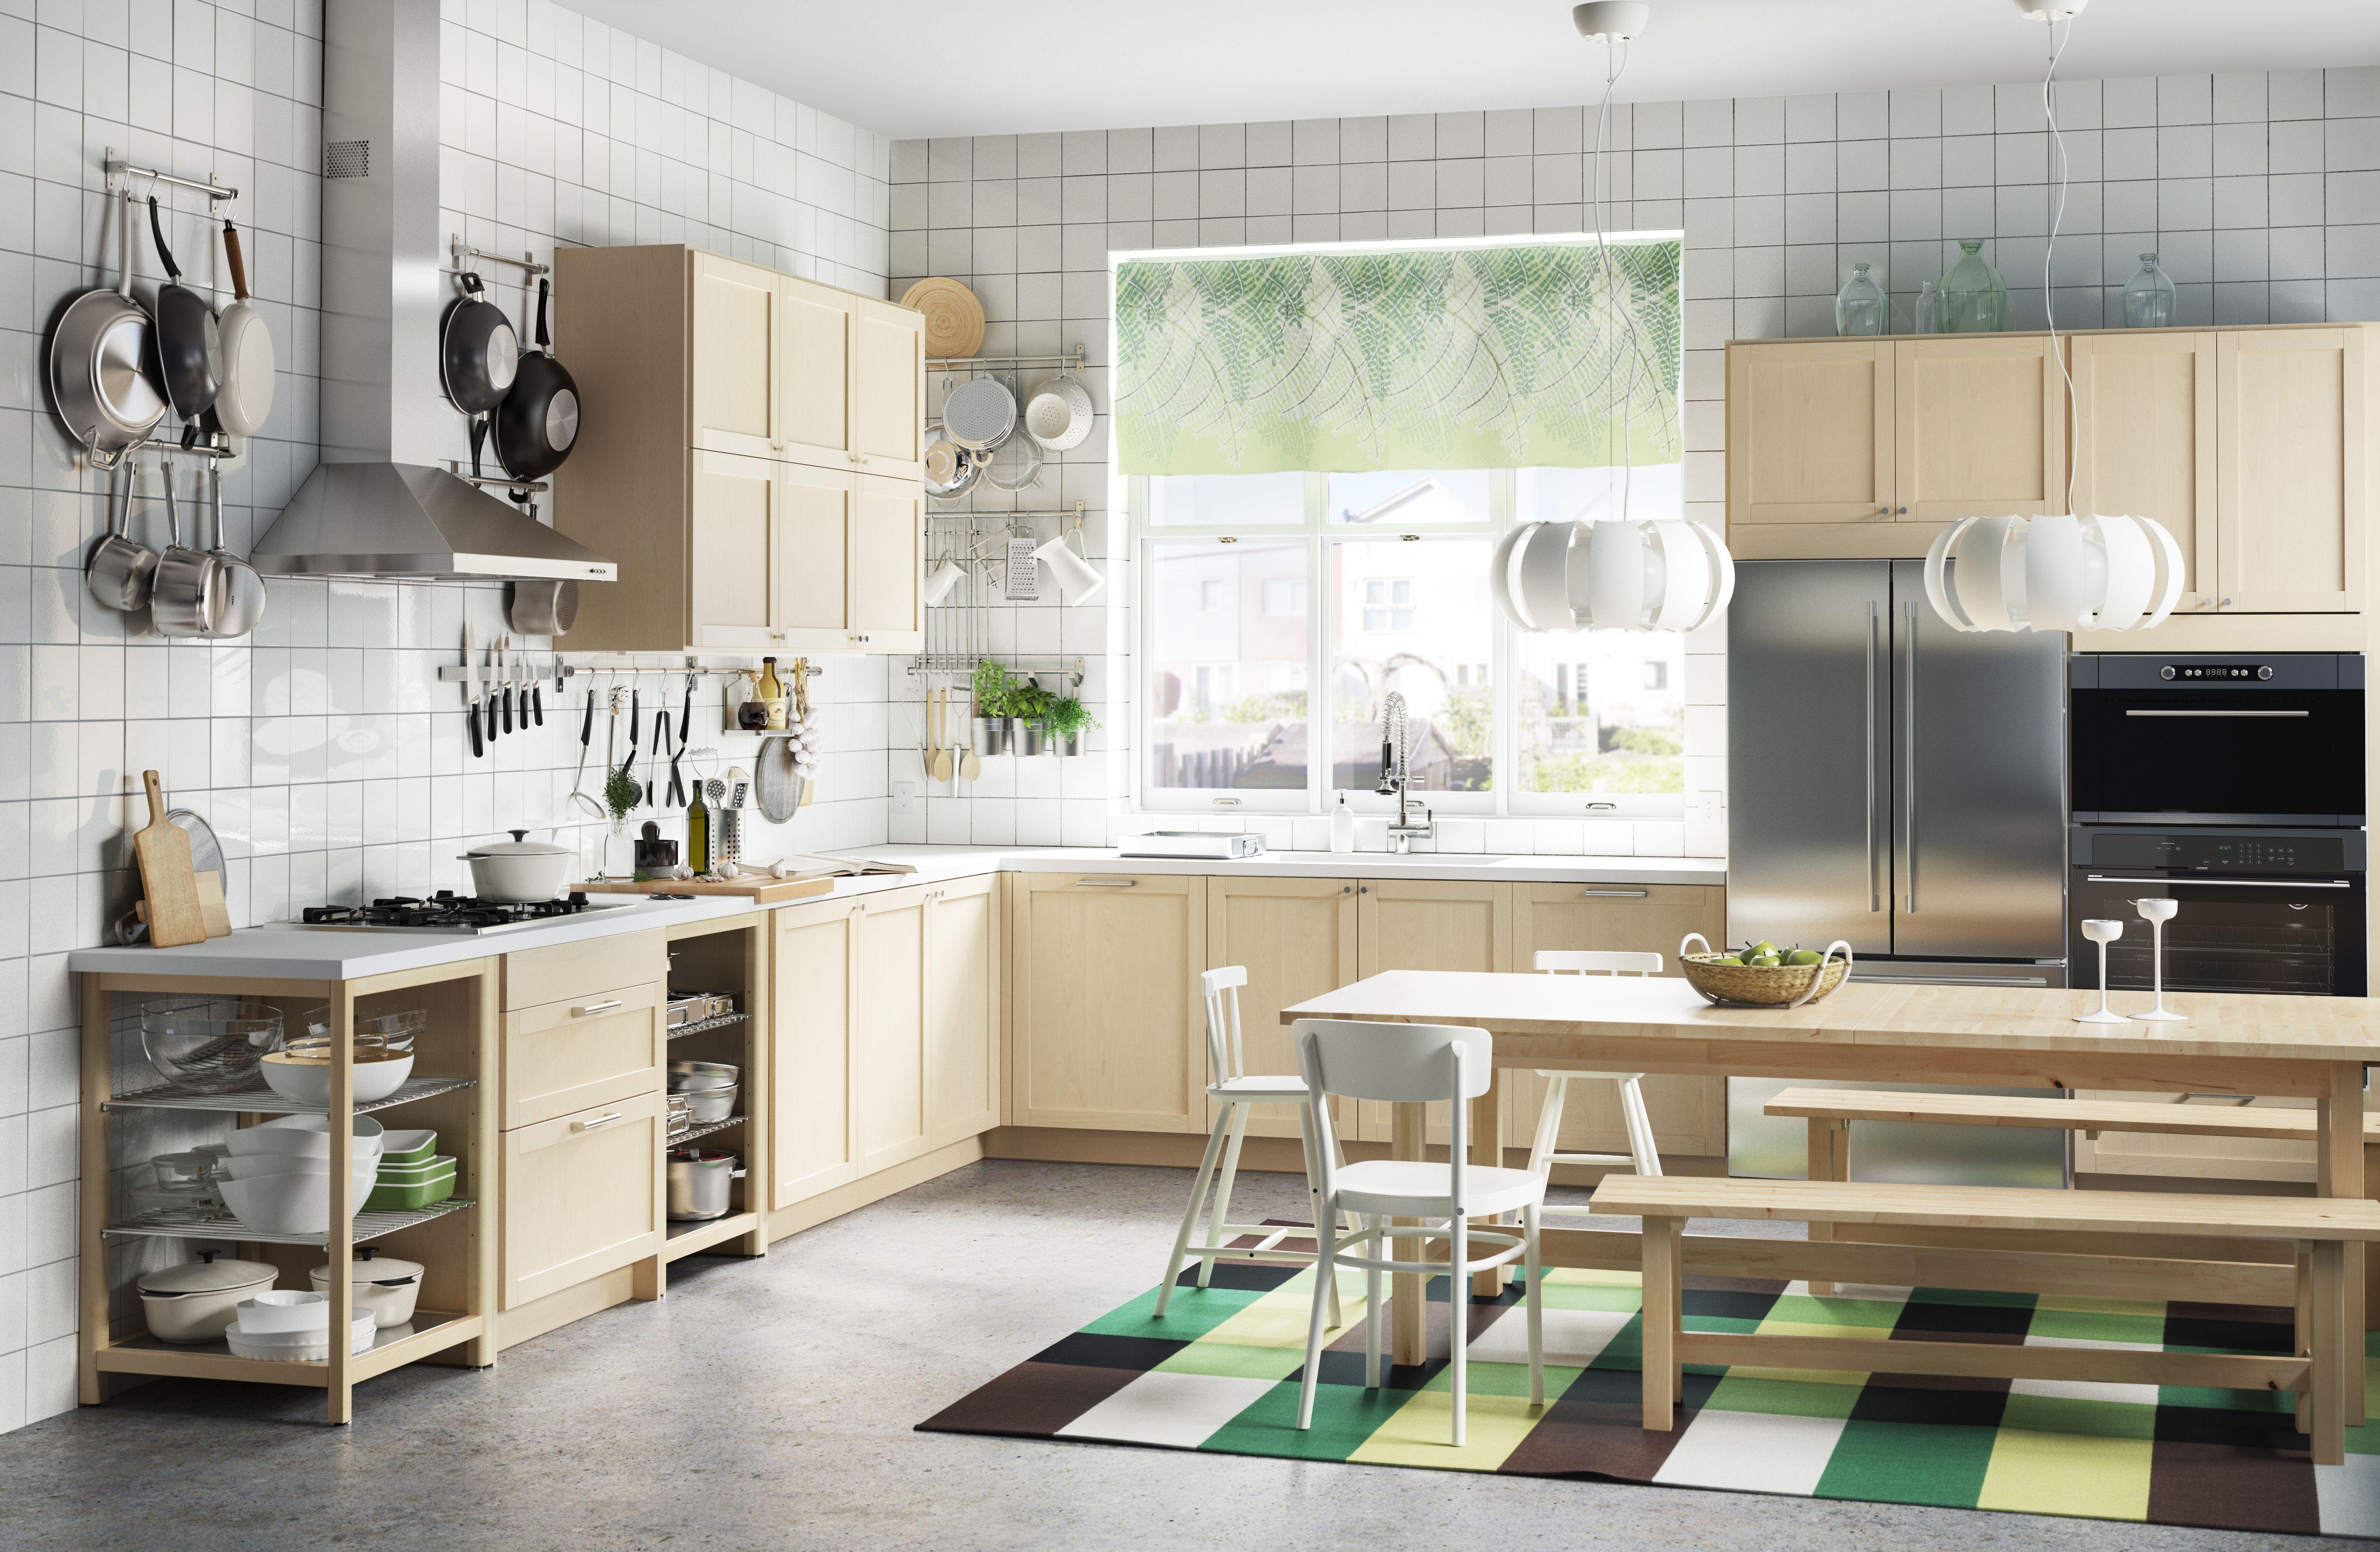 tapetes grandes na cozinha claro decorao tapetes ikeaportugal - Kchen Tapeten Modern